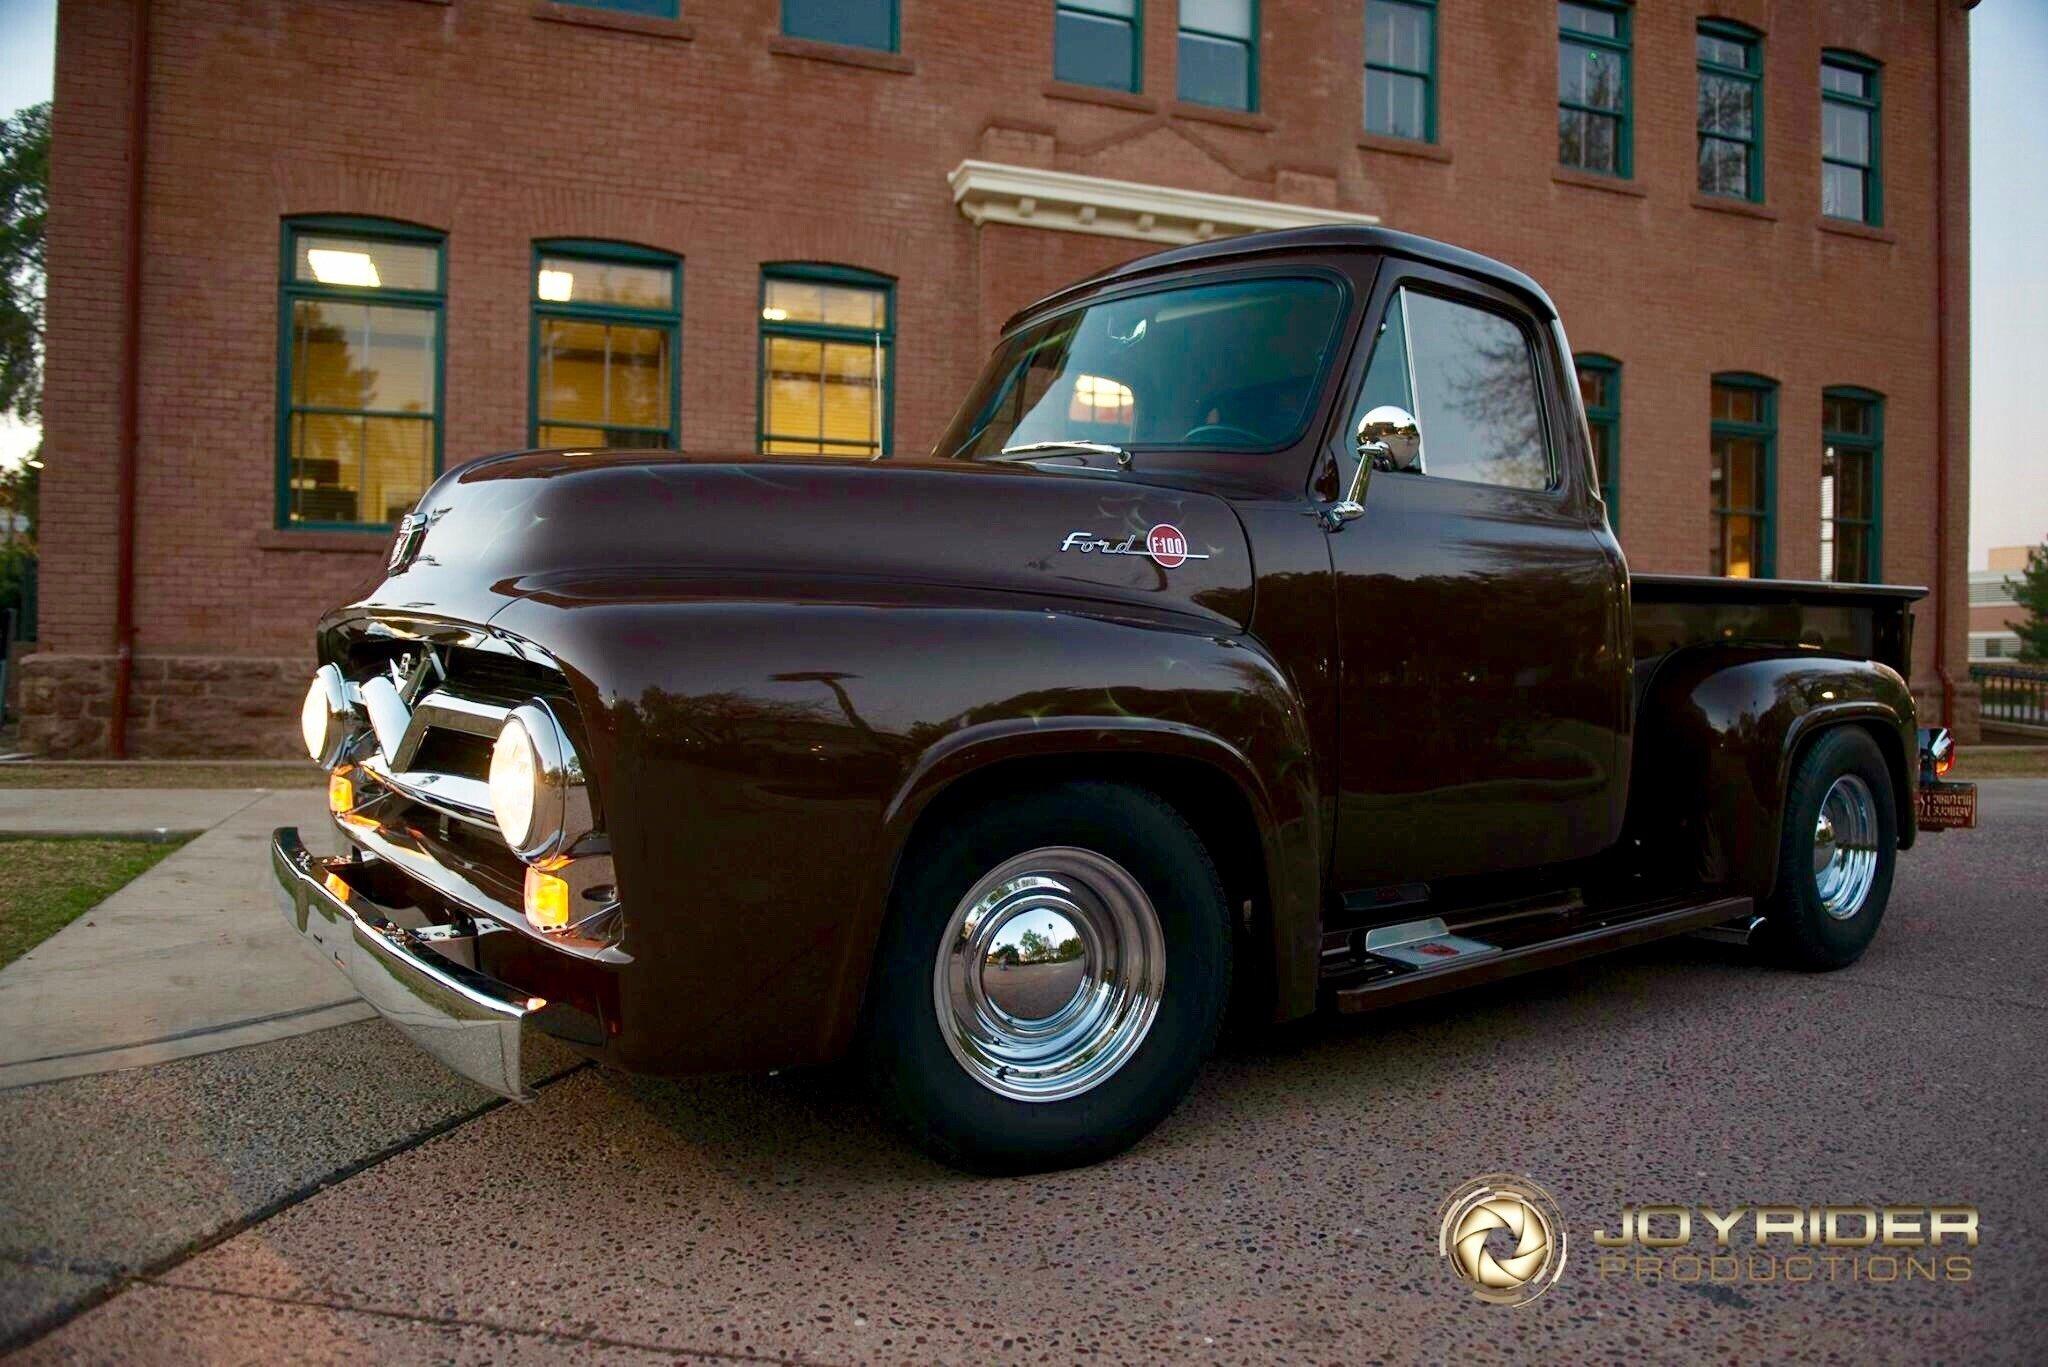 1955 F100 Ford Interior Kits Wiring Diagrams Seat For Sale Near Tempe Arizona 85284 Classics On Rh Autotrader Com